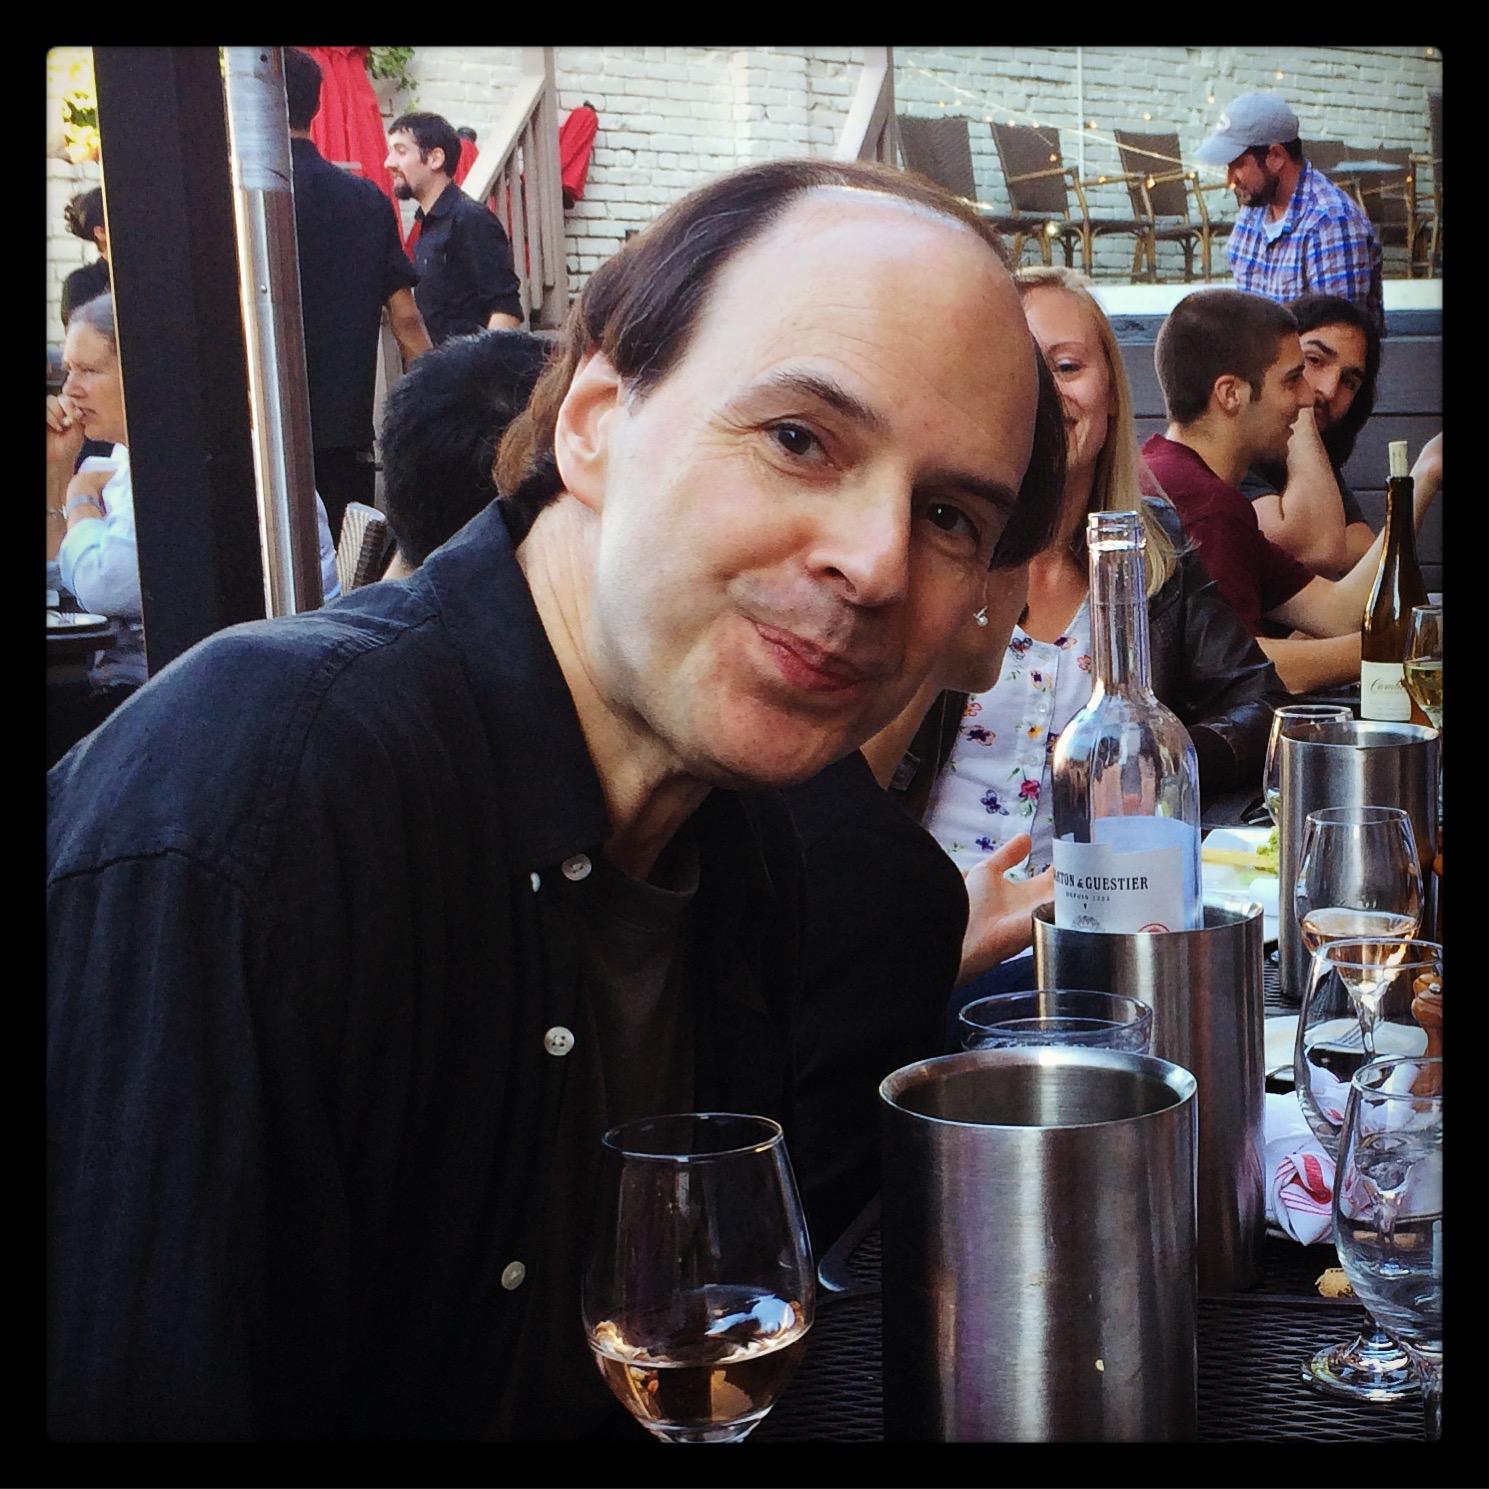 Jon Anthony - Bioinformatics Specialst